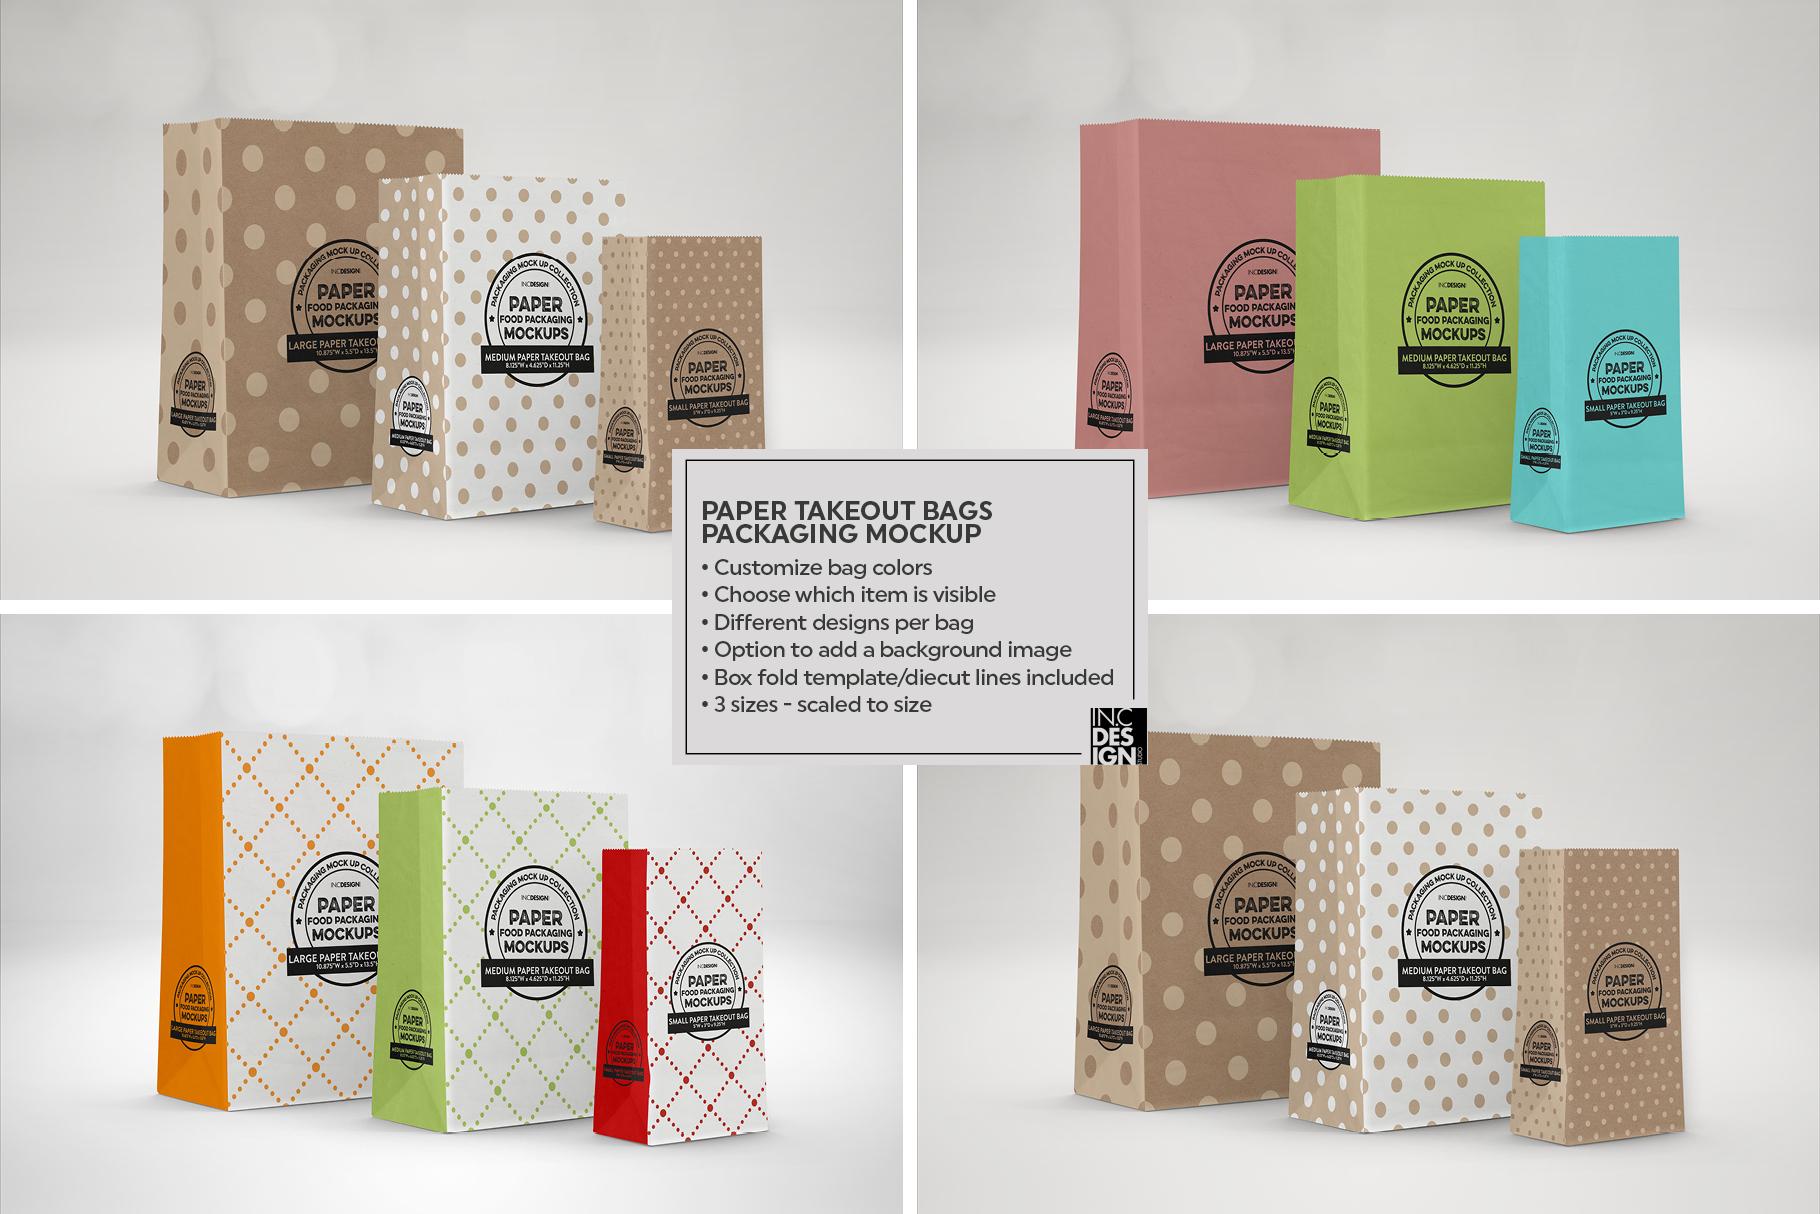 VOL. 17 Paper Box Packaging Mockups example image 3